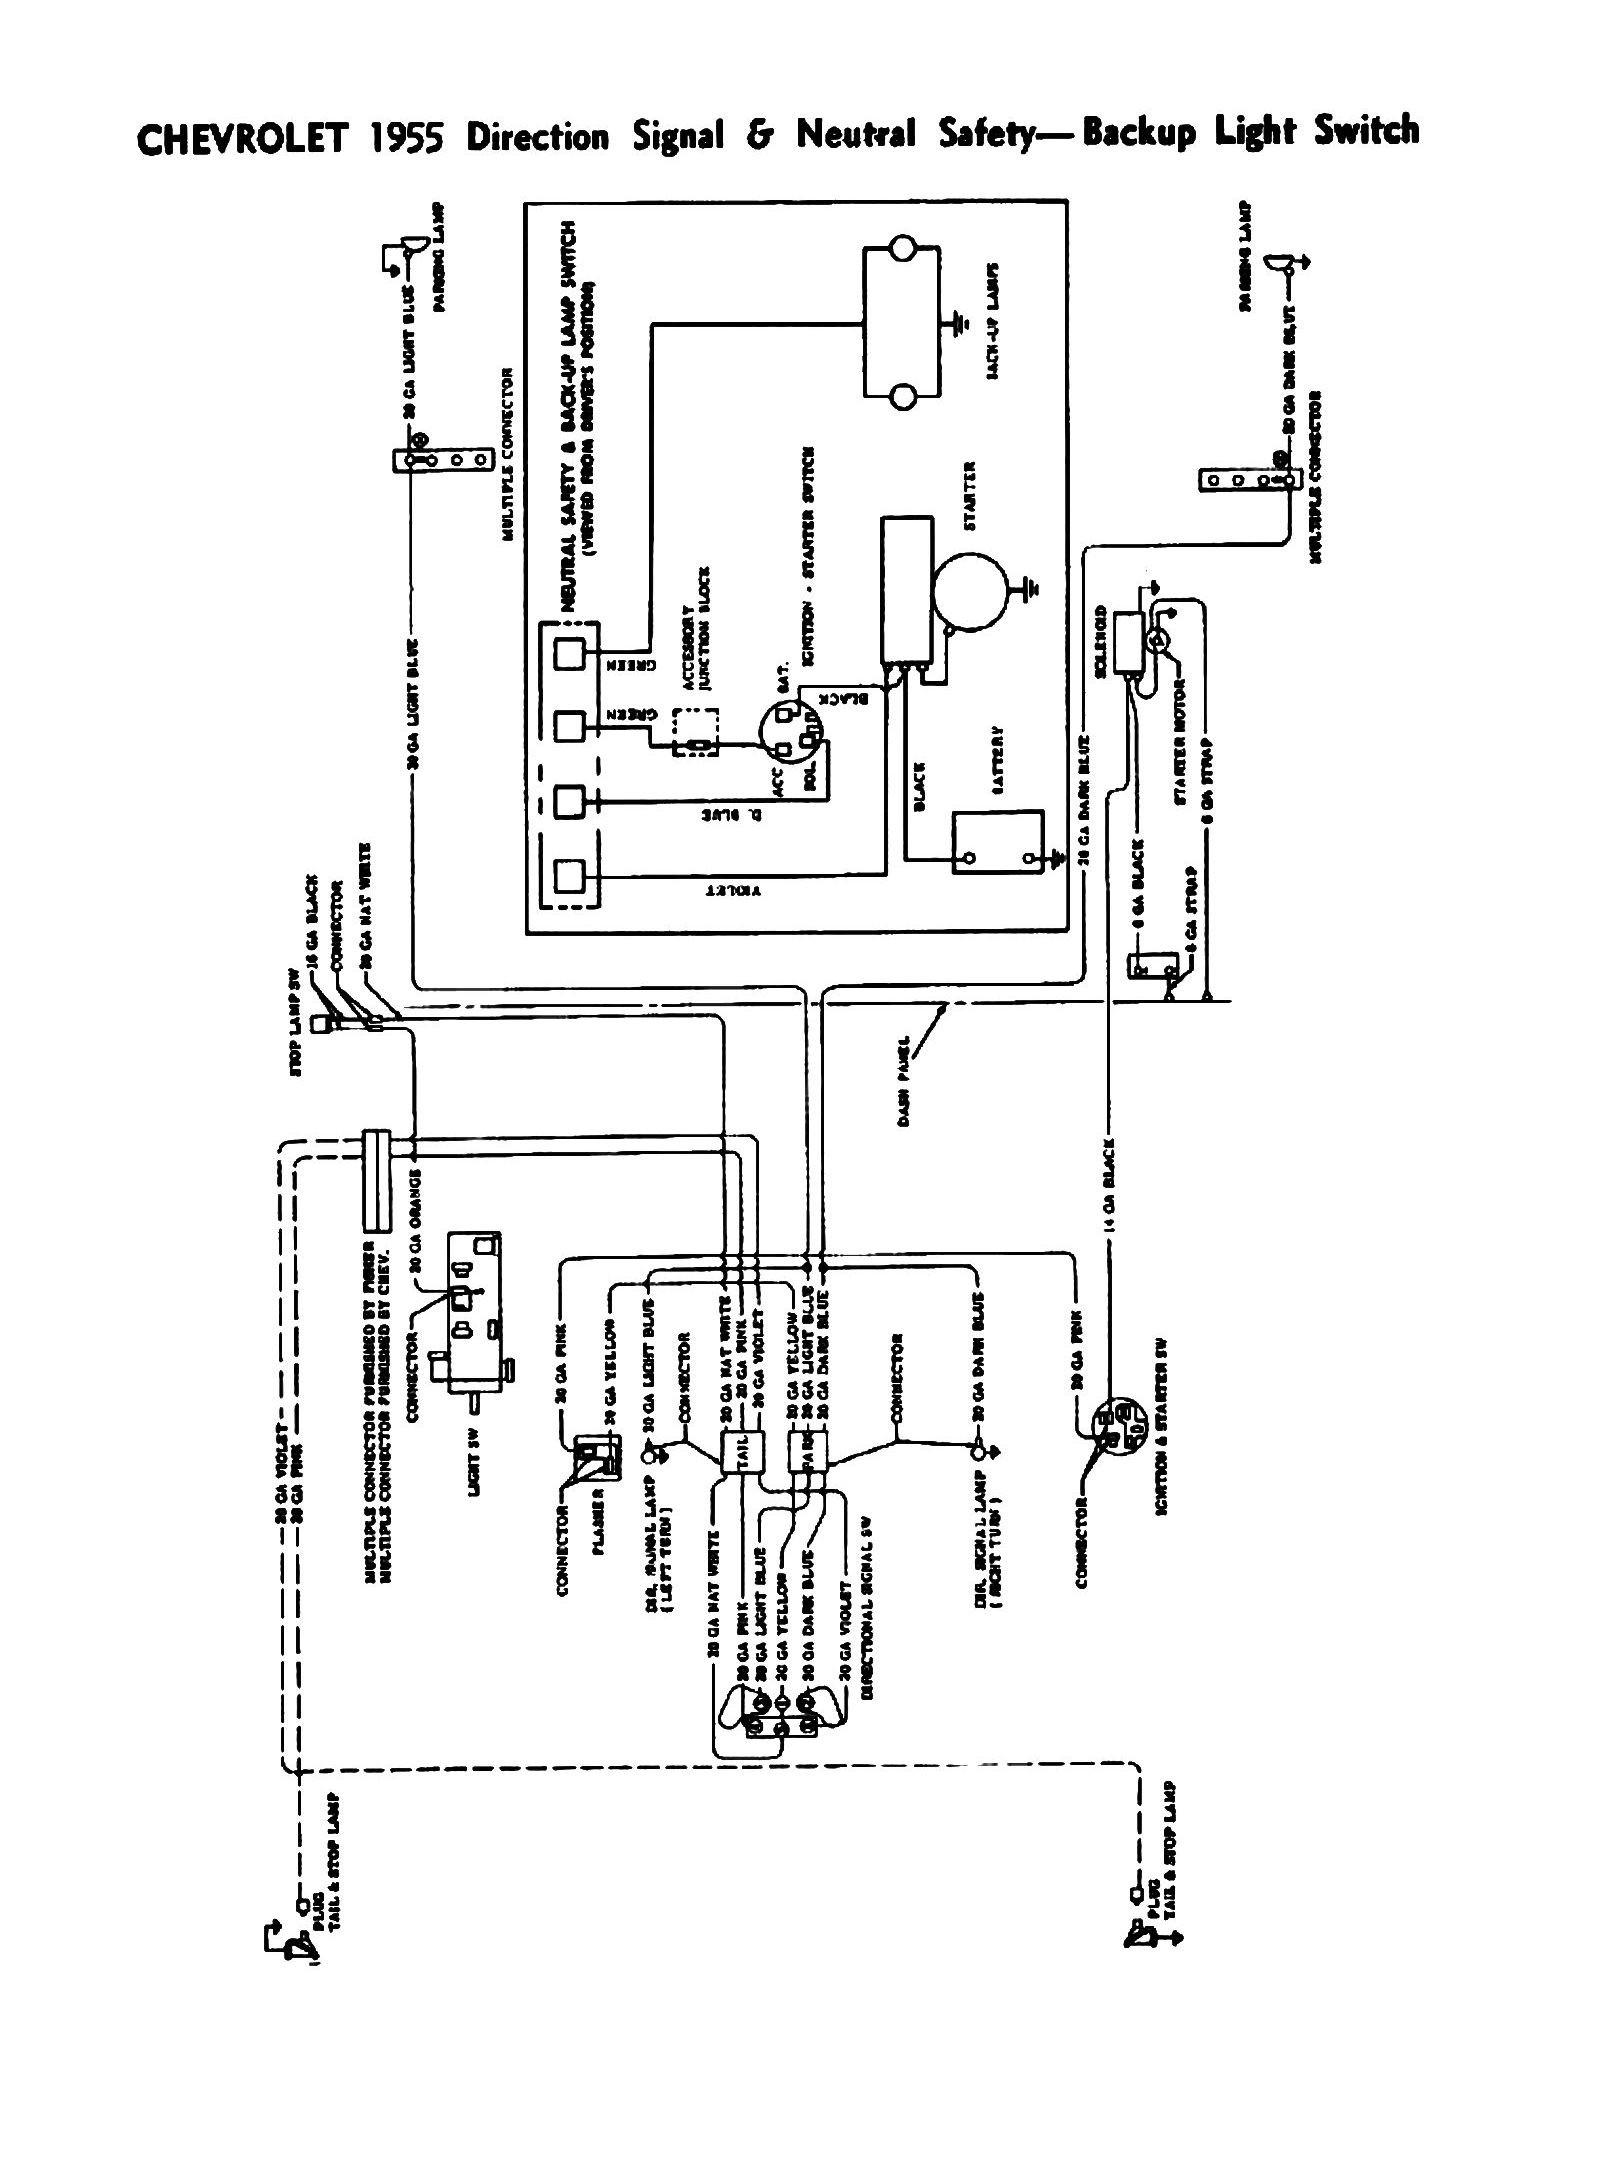 Universal Ignition Switch Wiring Diagram Wiring Diagram